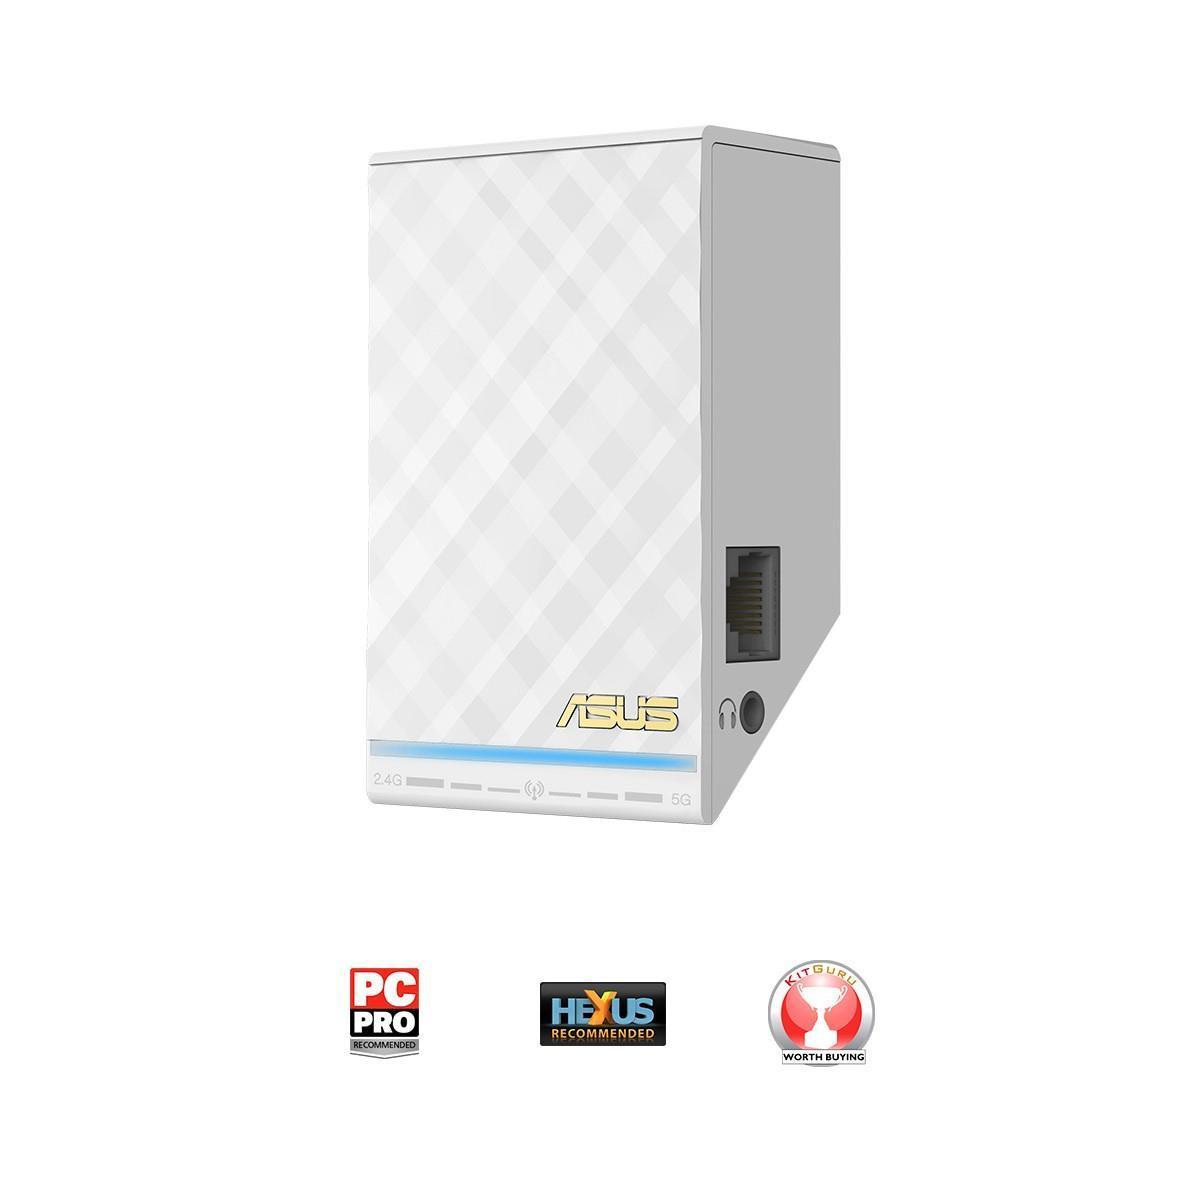 Netgear Prosafe 10 Dbi Directional Antenna Electronic Deals Uk Tp Link 24ghz 5dbi Indoor Desktop Omni Tl Ant2405c Asus Rp Ac52 Dual Band Wireless Ac750 Range Extender Access Point